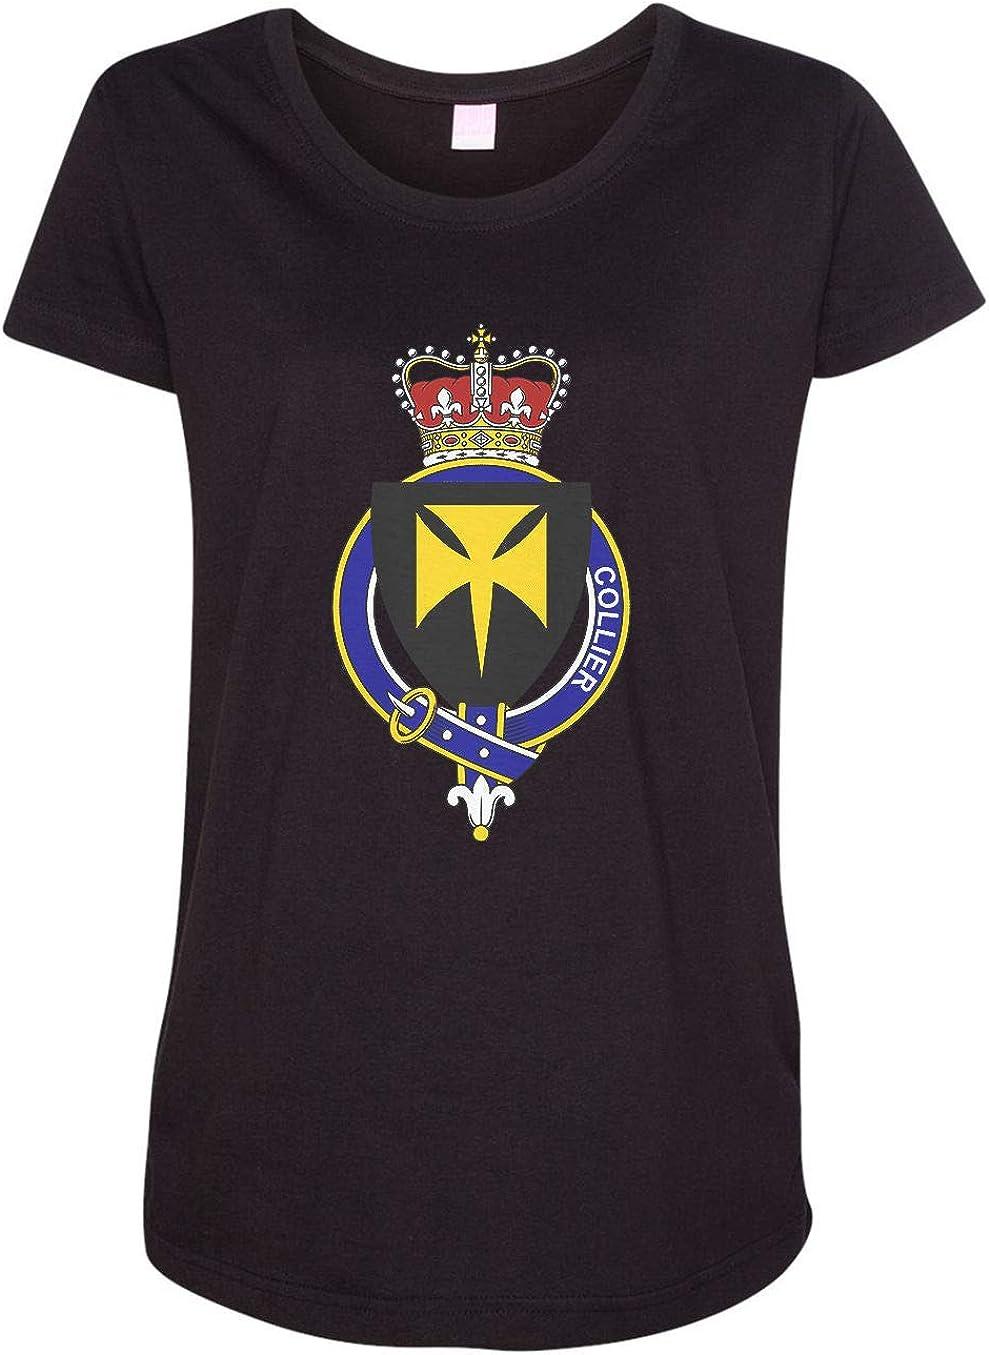 HARD EDGE DESIGN Women's English Garter Family Collier T-Shirt